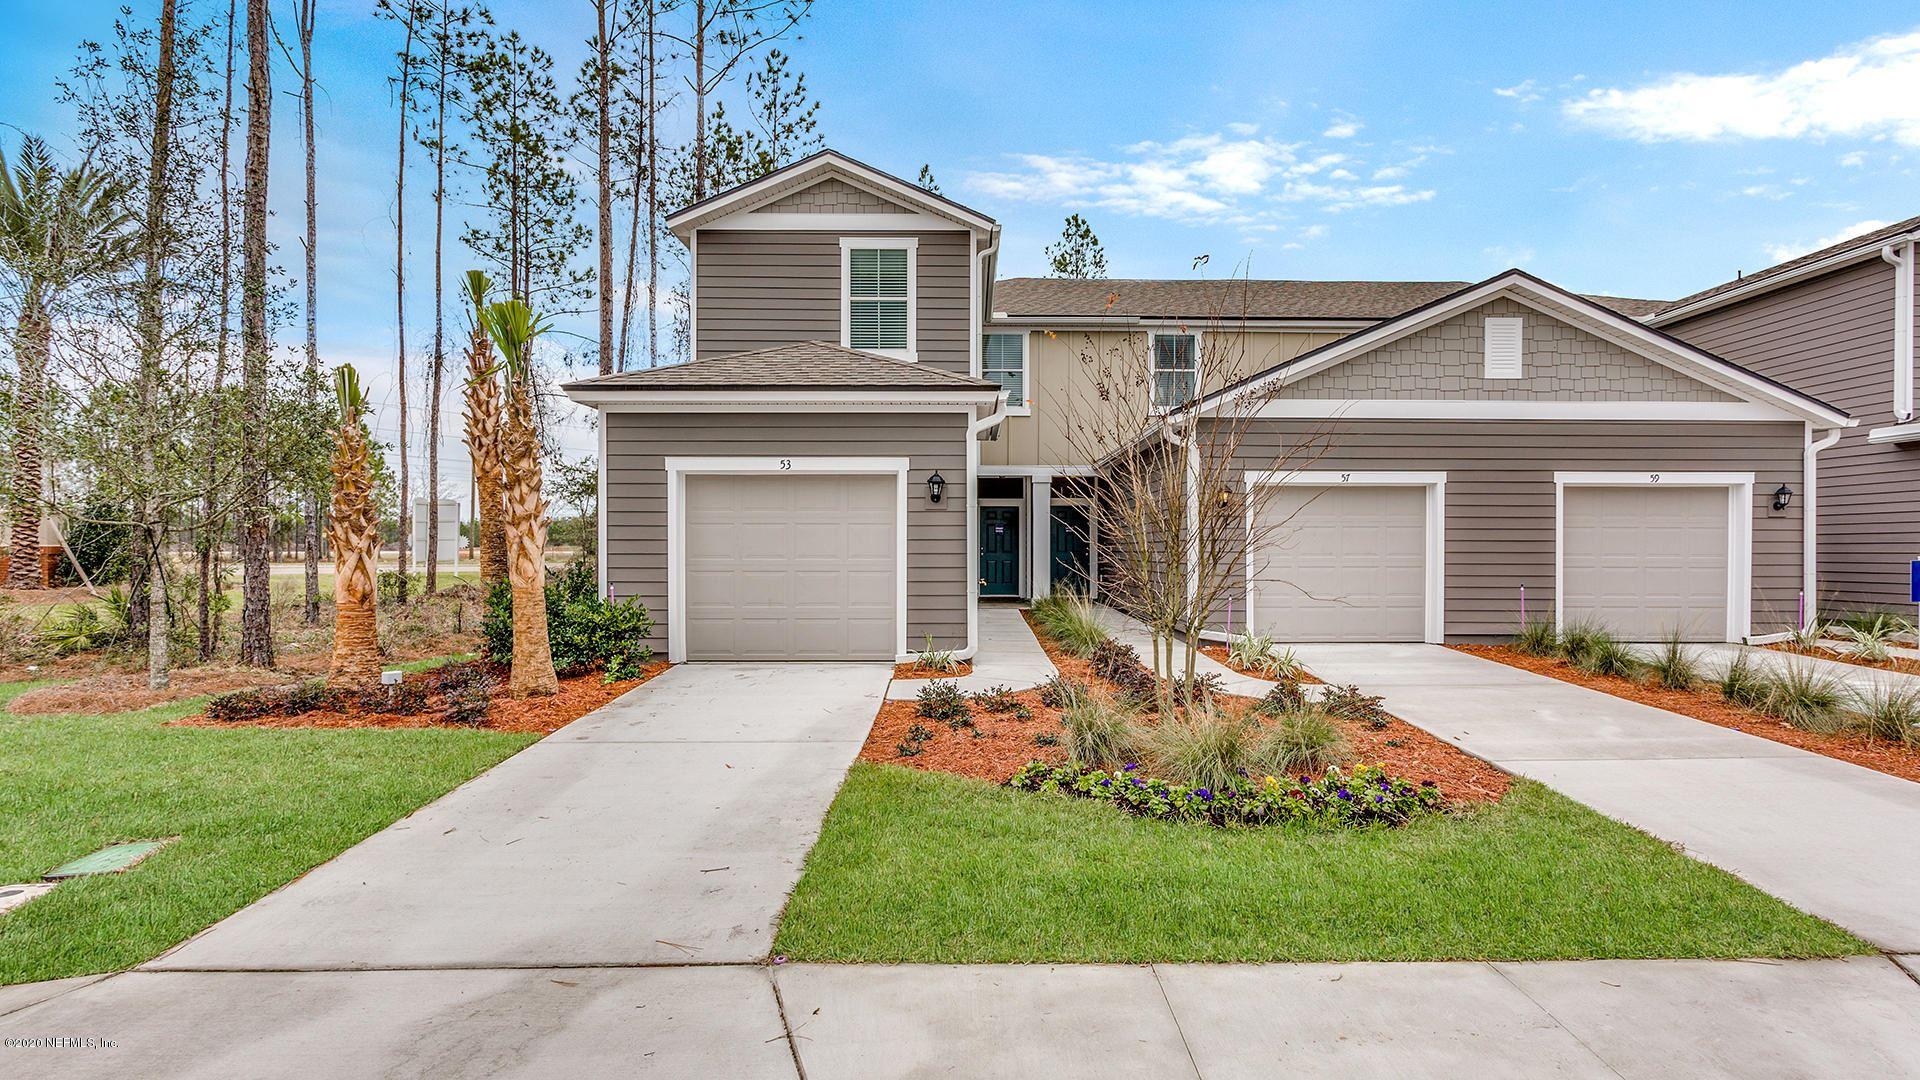 242 ARALIA LN #Lot No: 128, Jacksonville, FL 32216 - MLS#: 1106118